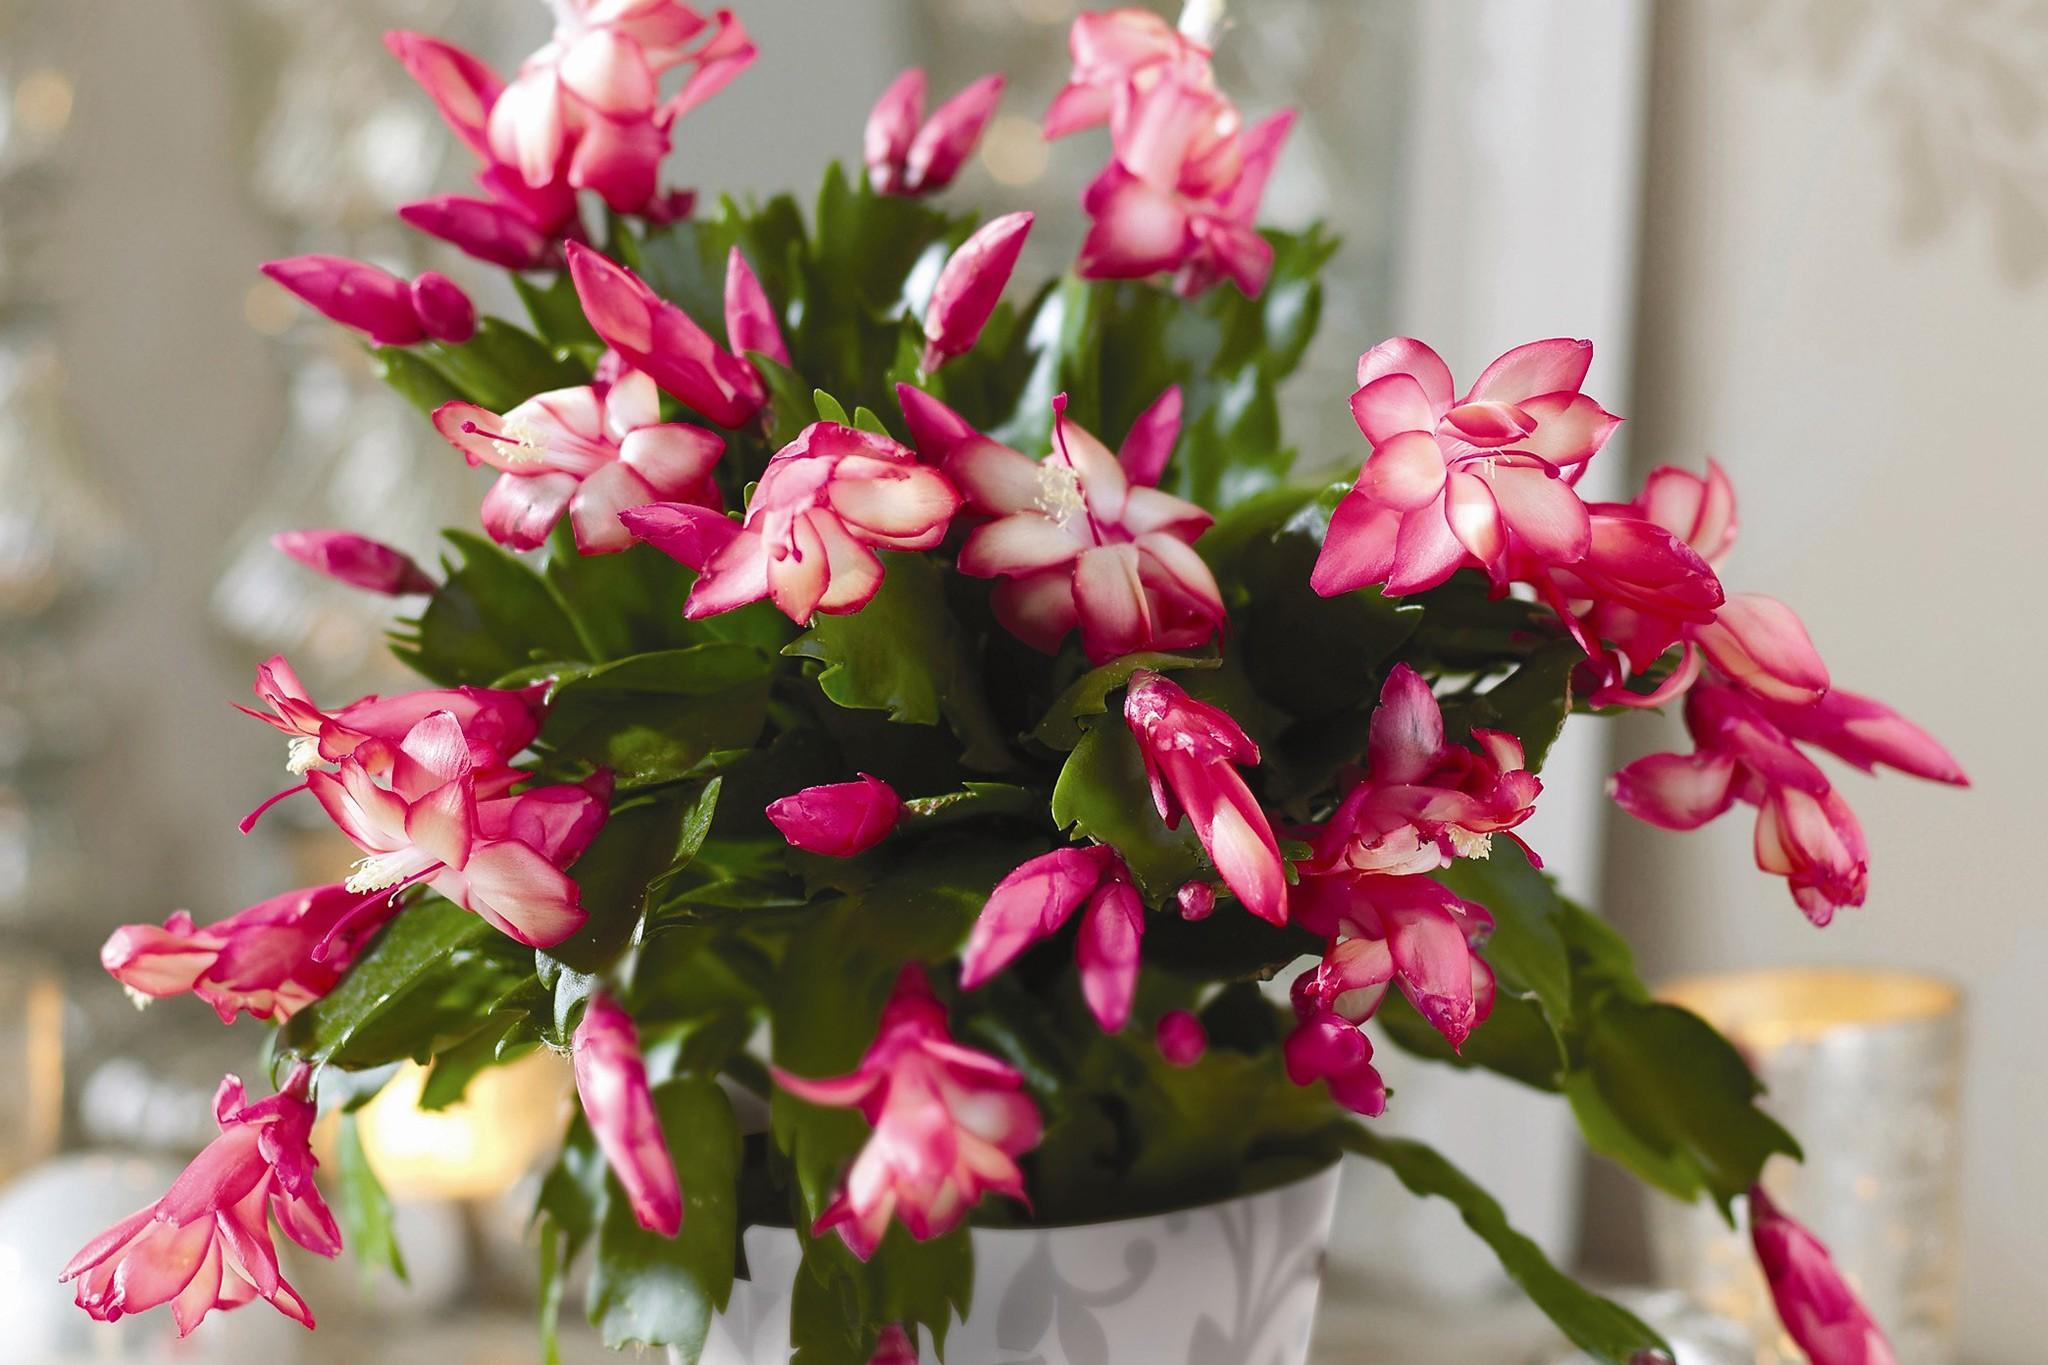 Pink-flowered Christmas cactus